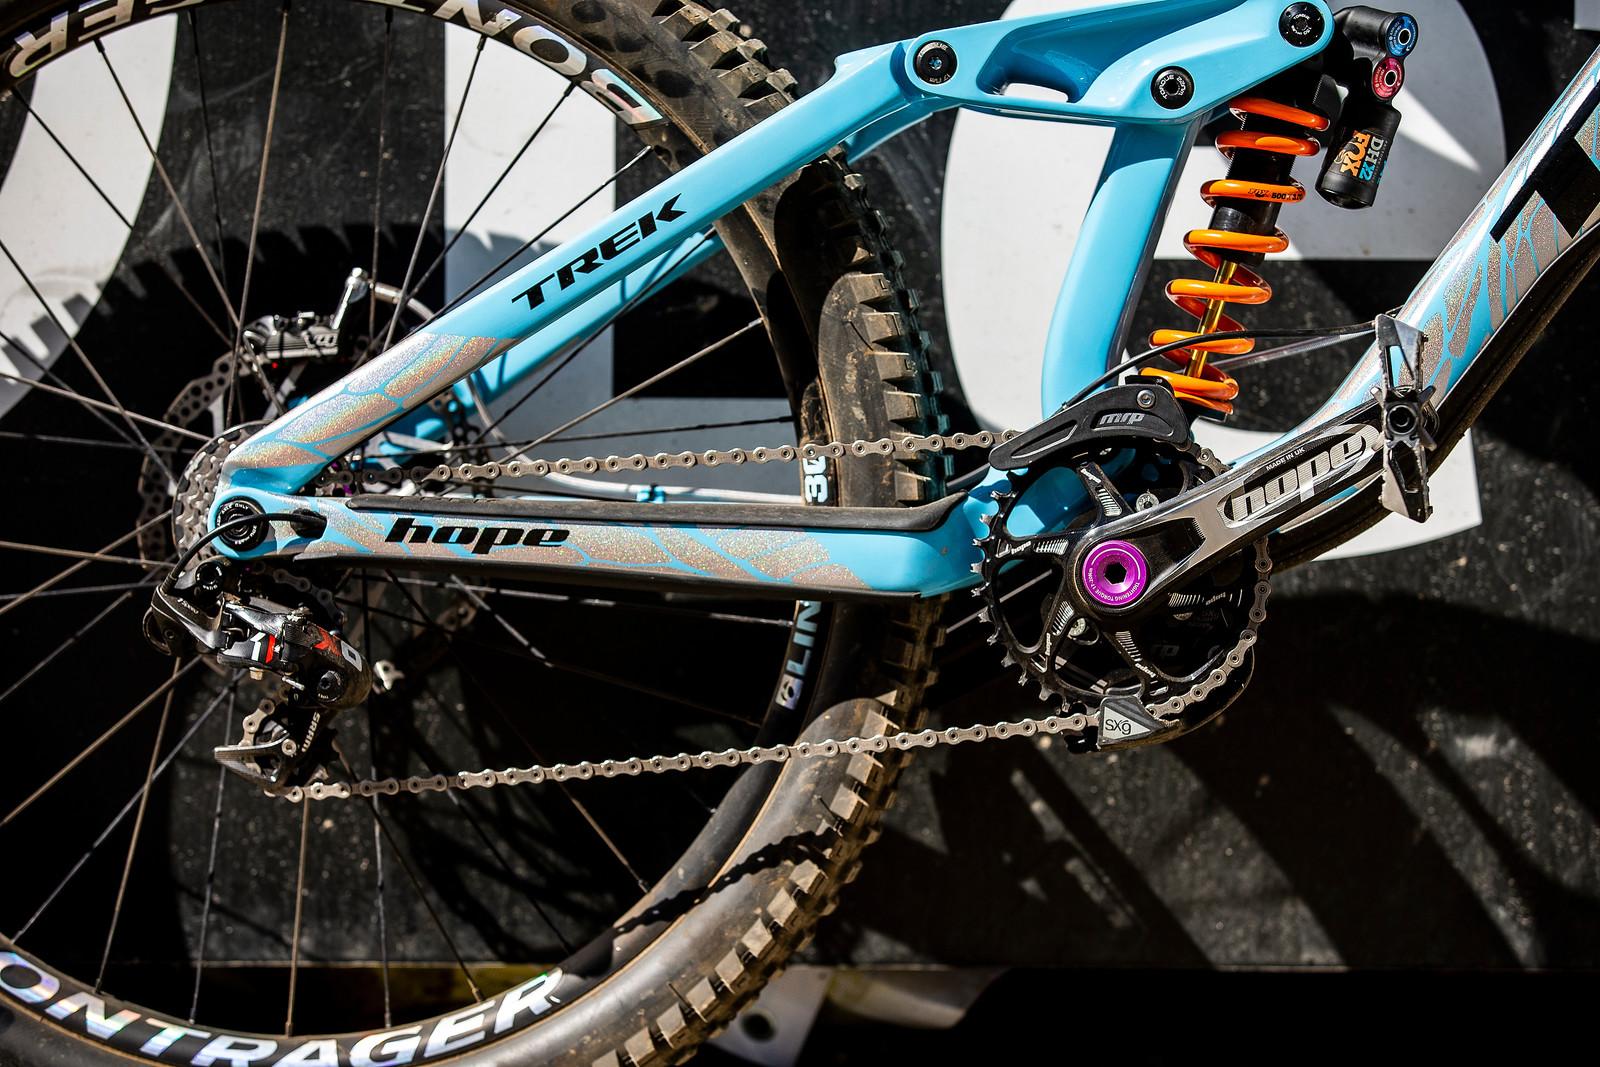 Rear End - WINNING BIKE - Rachel Atherton's Trek Session - Mountain Biking Pictures - Vital MTB